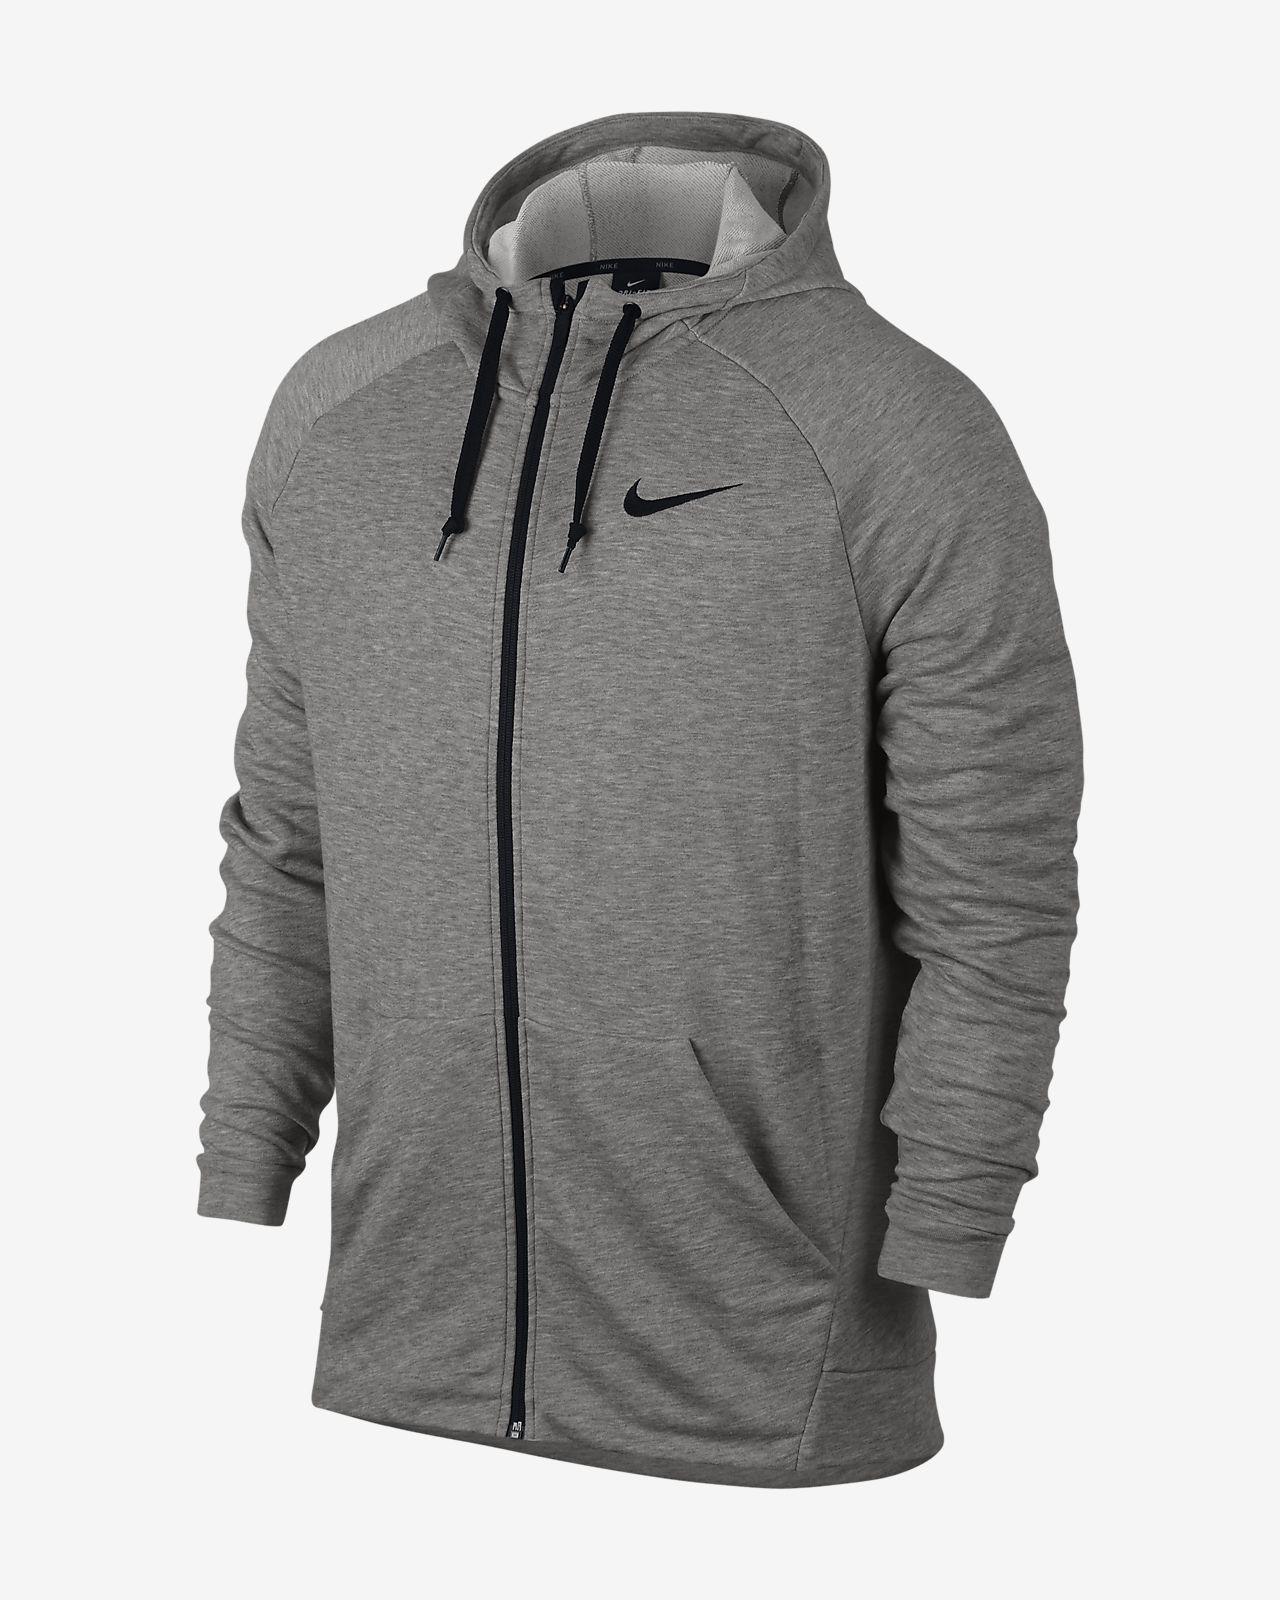 Dri FIT Hoodies & Sweatshirts. Nike